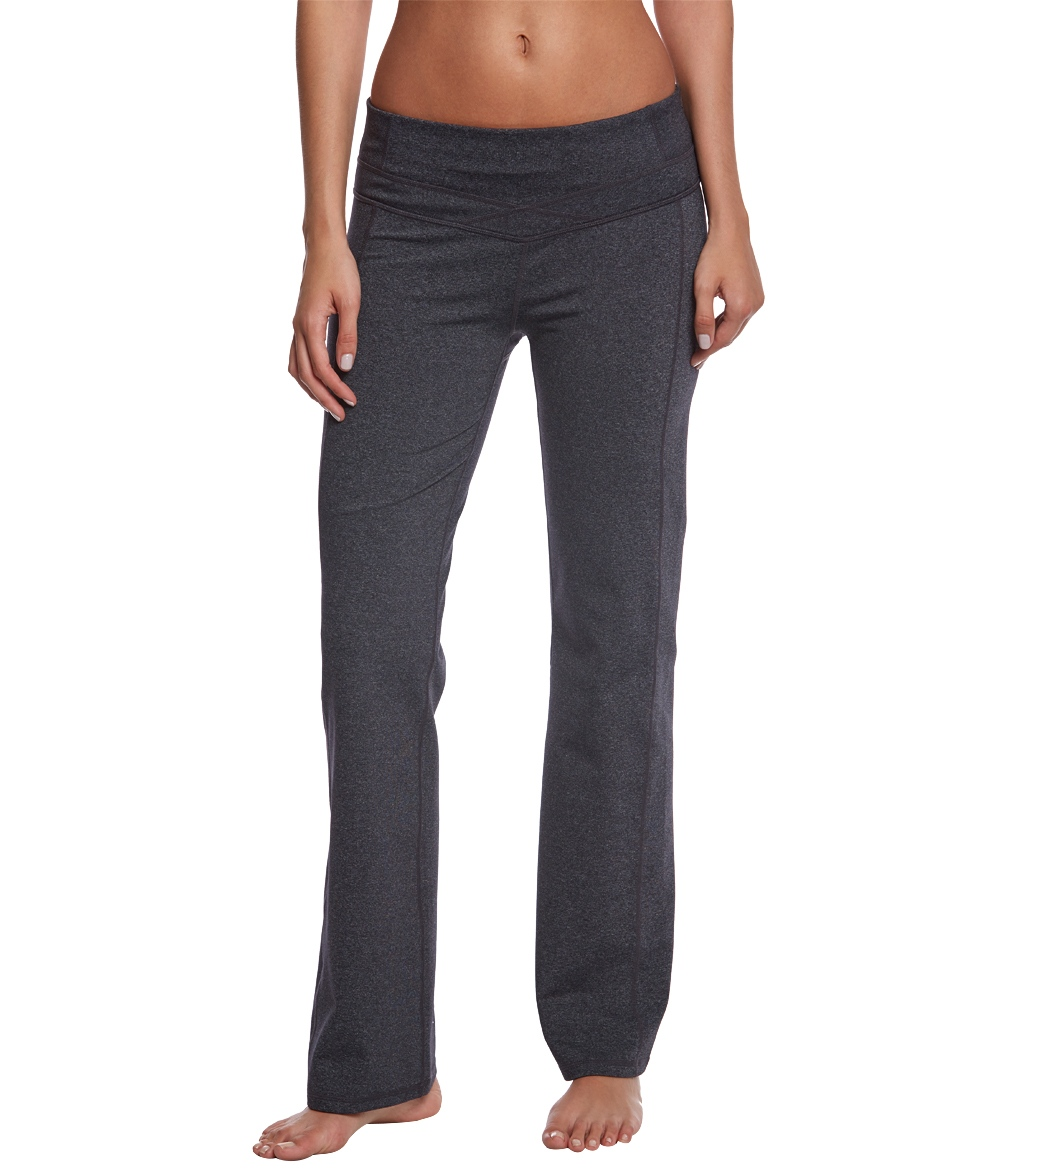 Prana Britta Short Inseam Yoga Pants At SwimOutlet.com